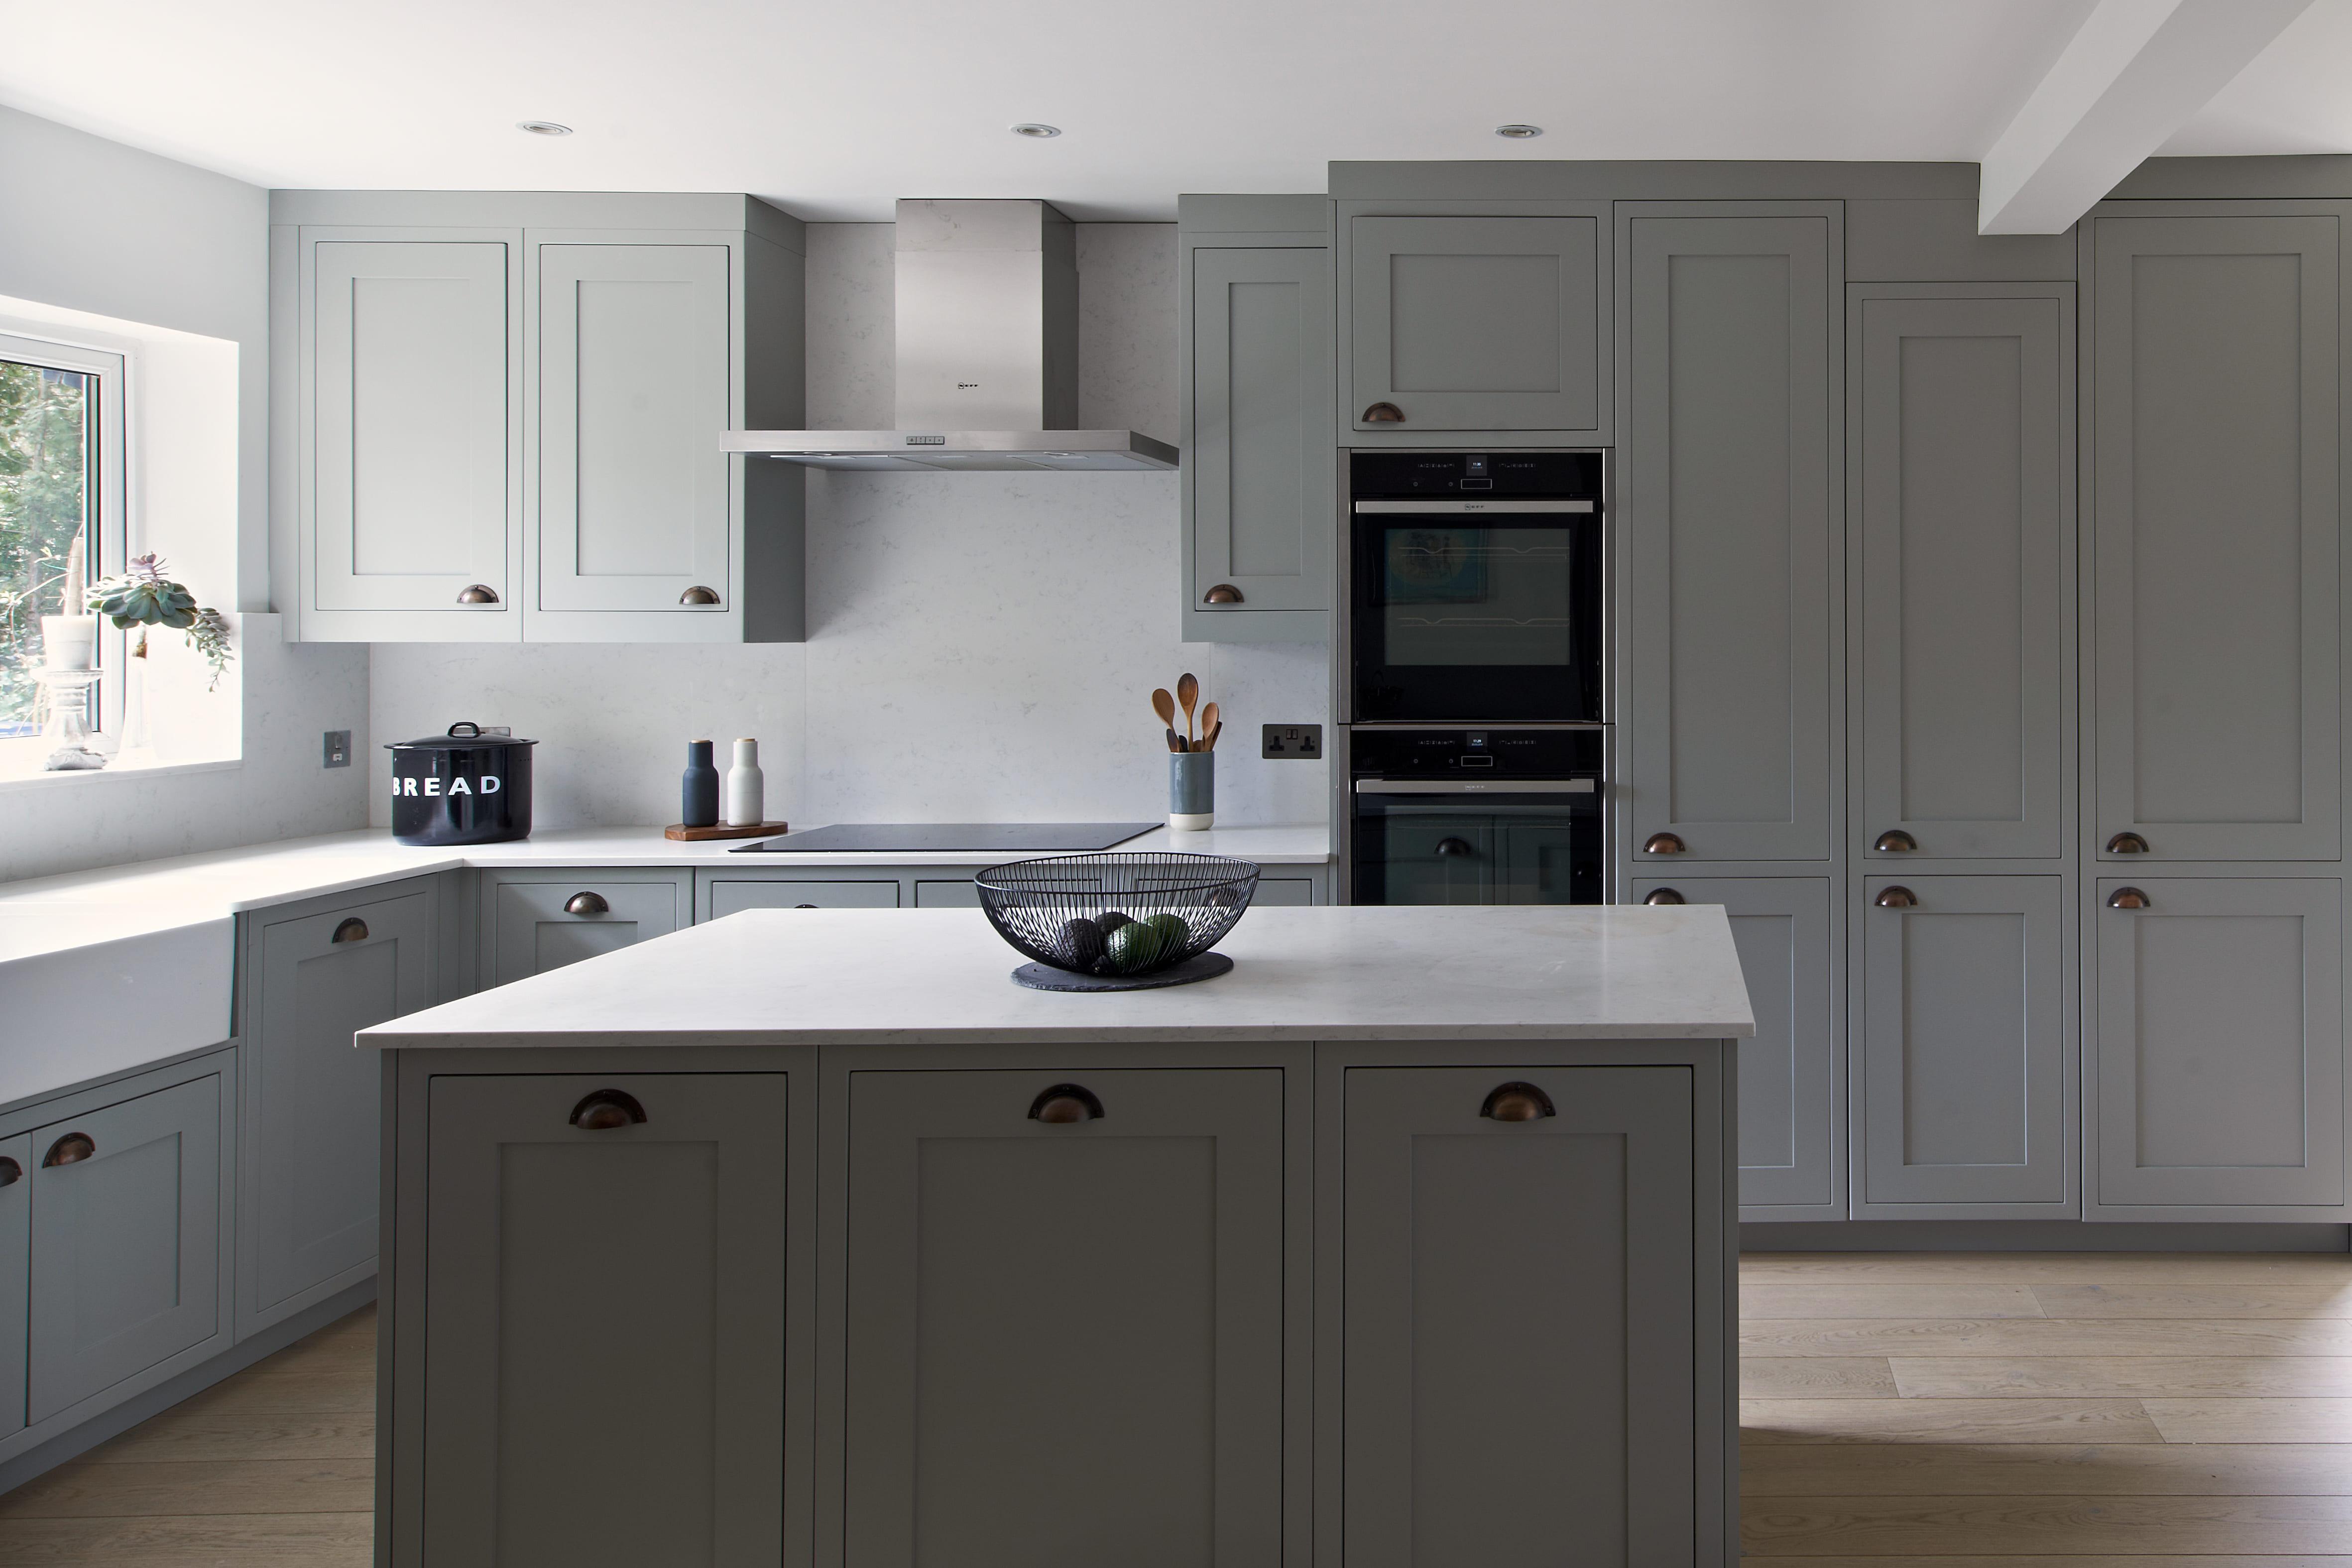 https://www.designer-kitchens.co.uk/wp-content/uploads/2019/10/MAZURE-38452-1.jpg